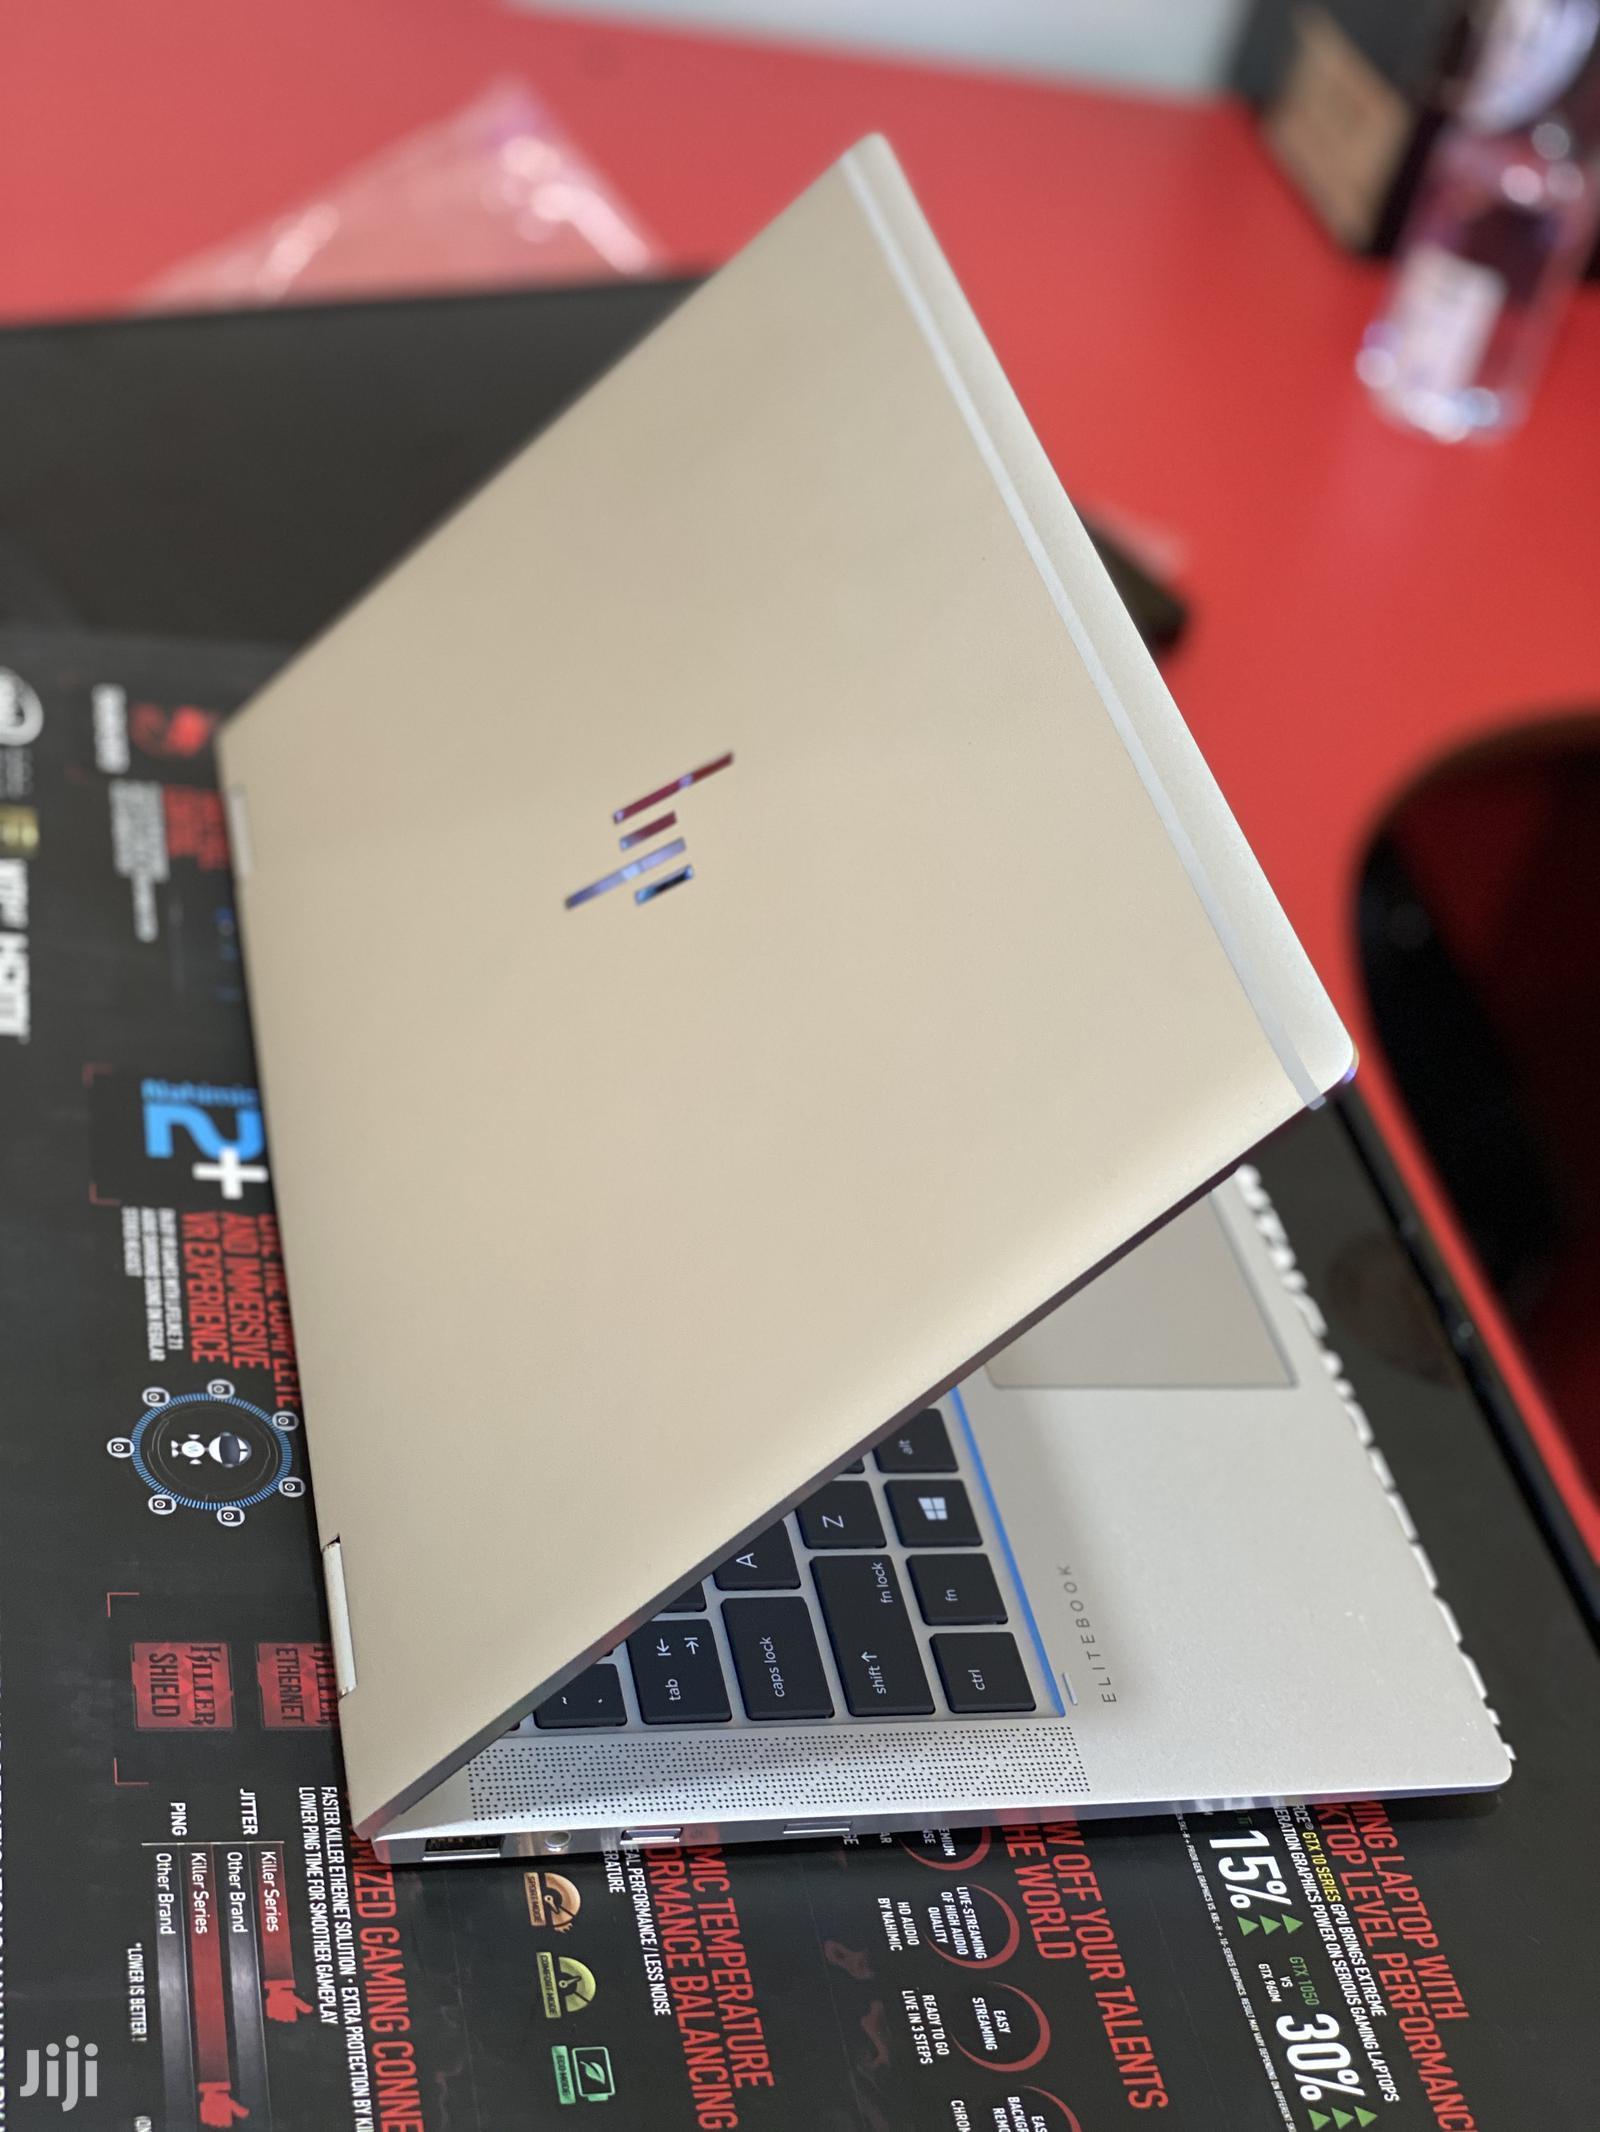 New Laptop HP EliteBook 1040 G4 16GB Intel Core i7 SSHD (Hybrid) 512GB